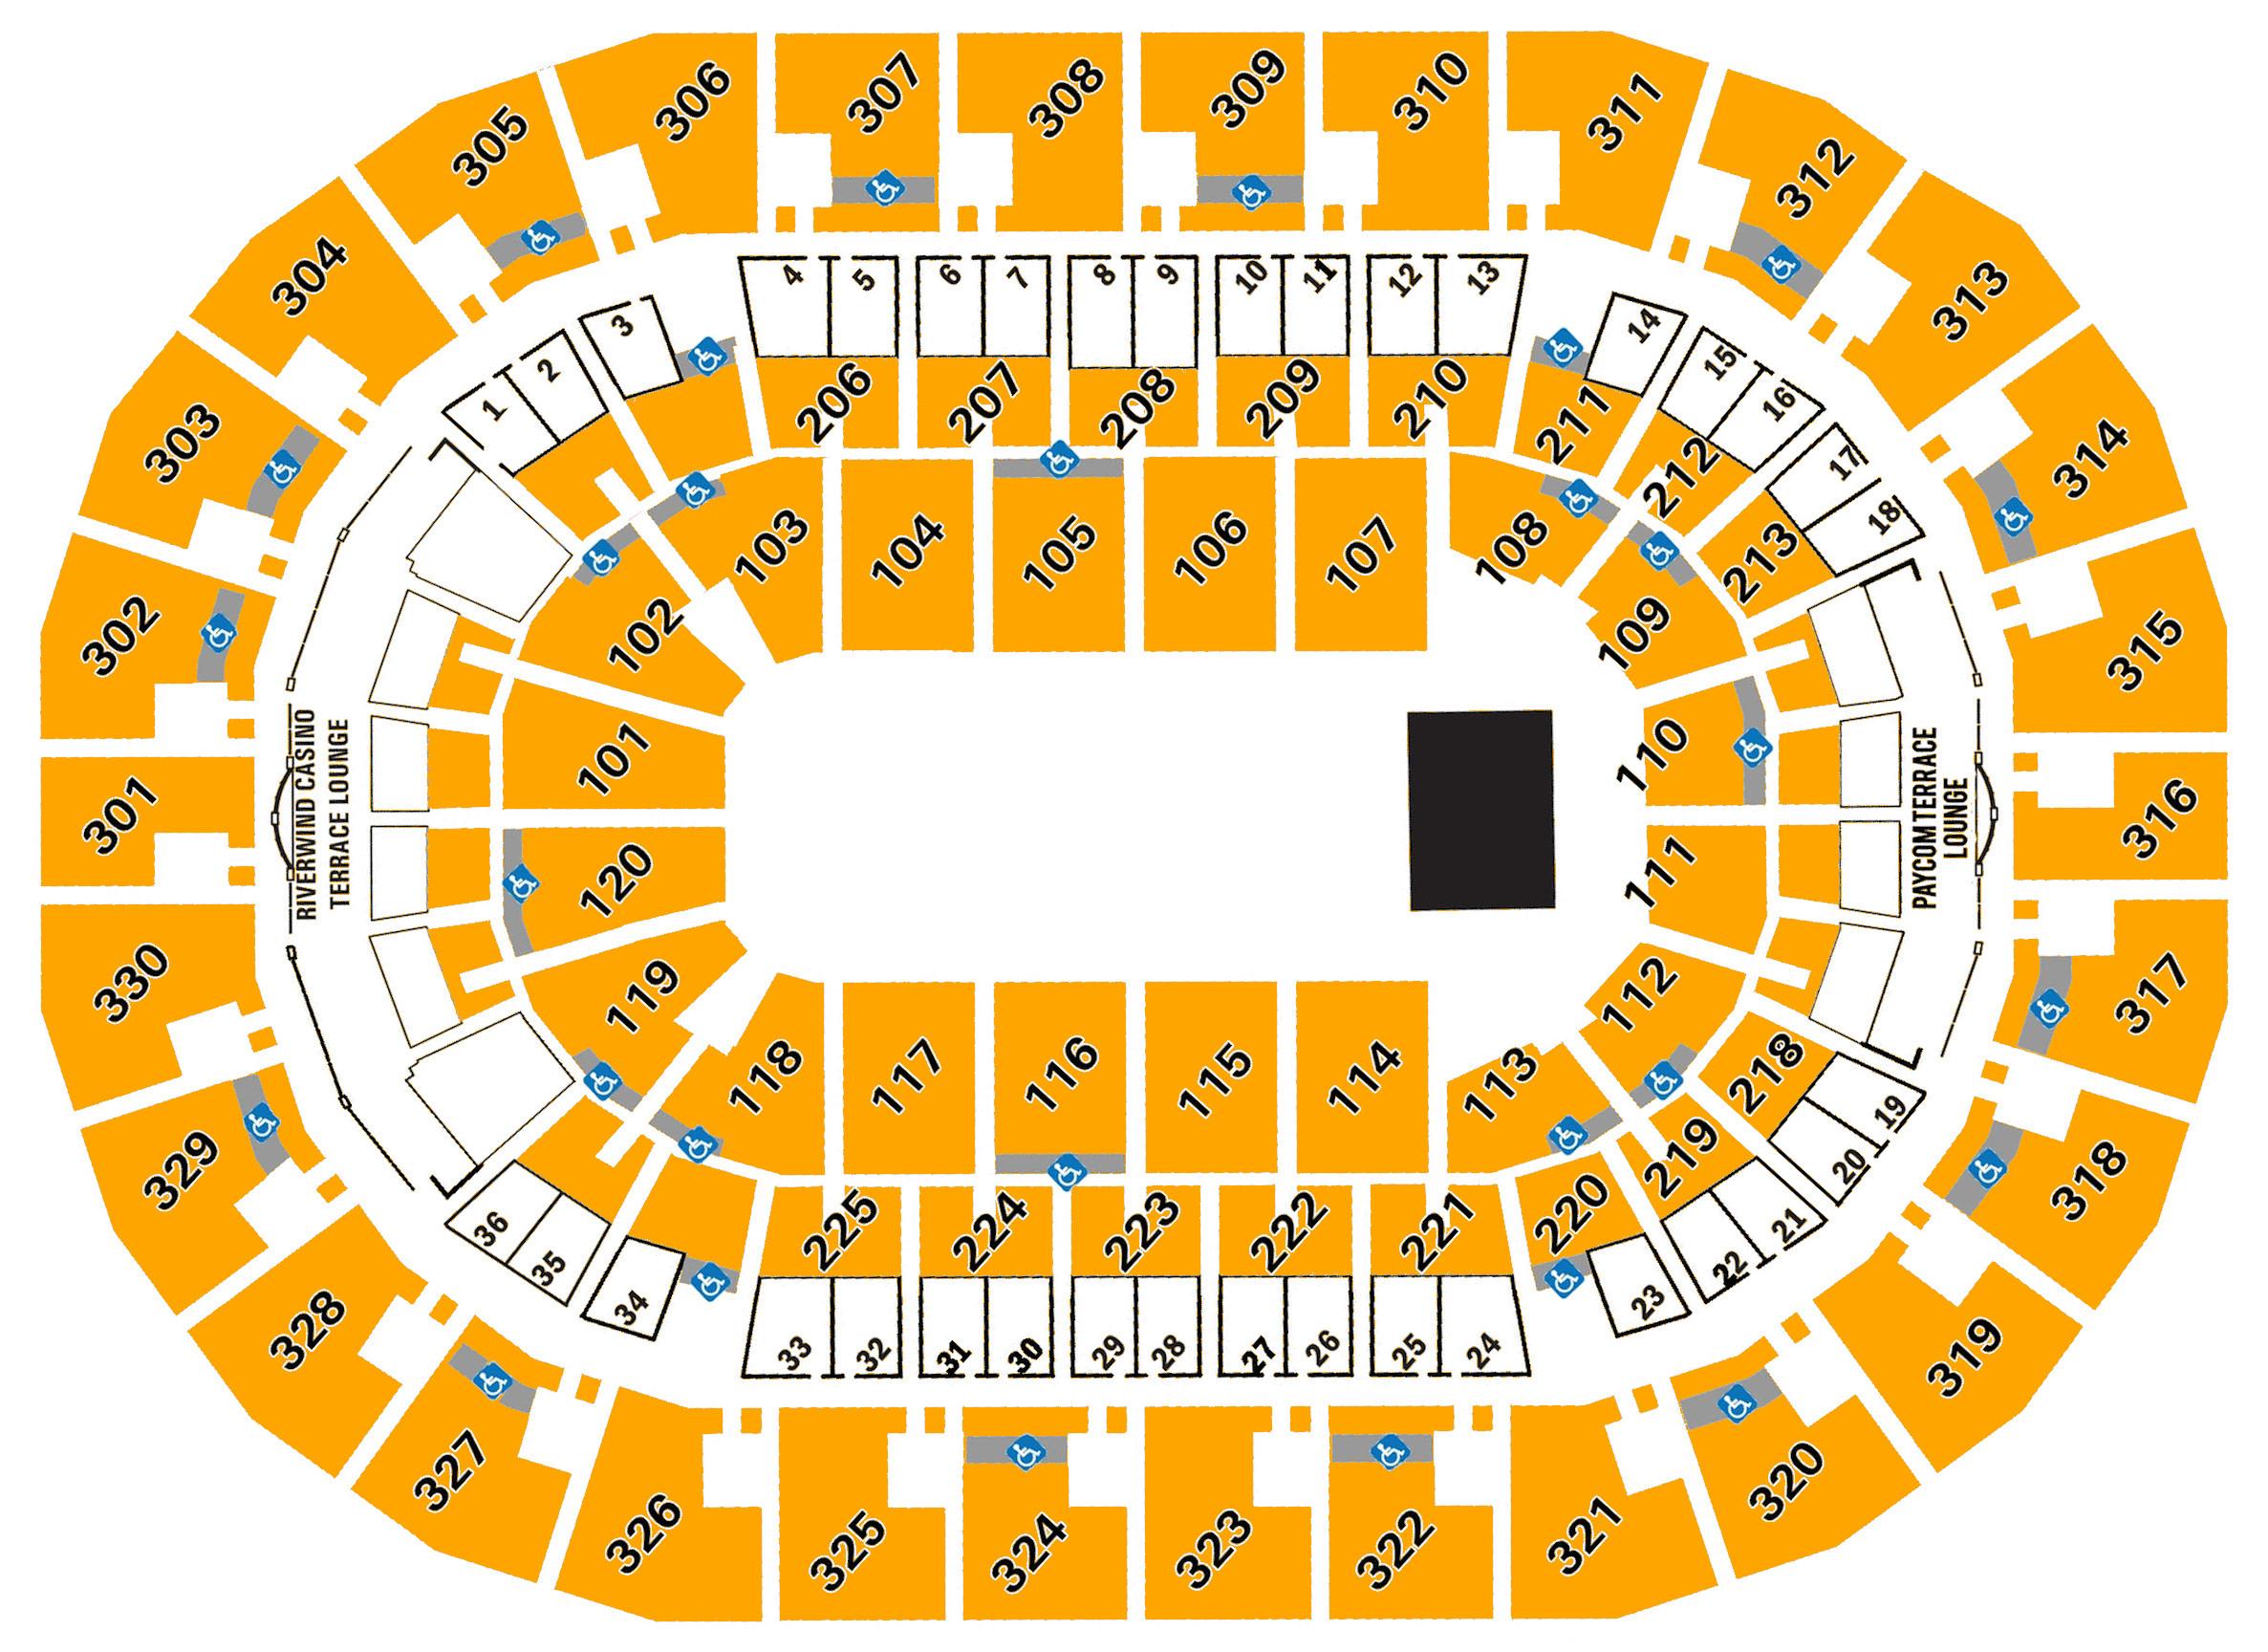 Chesapeake Energy Arena Seating Chart